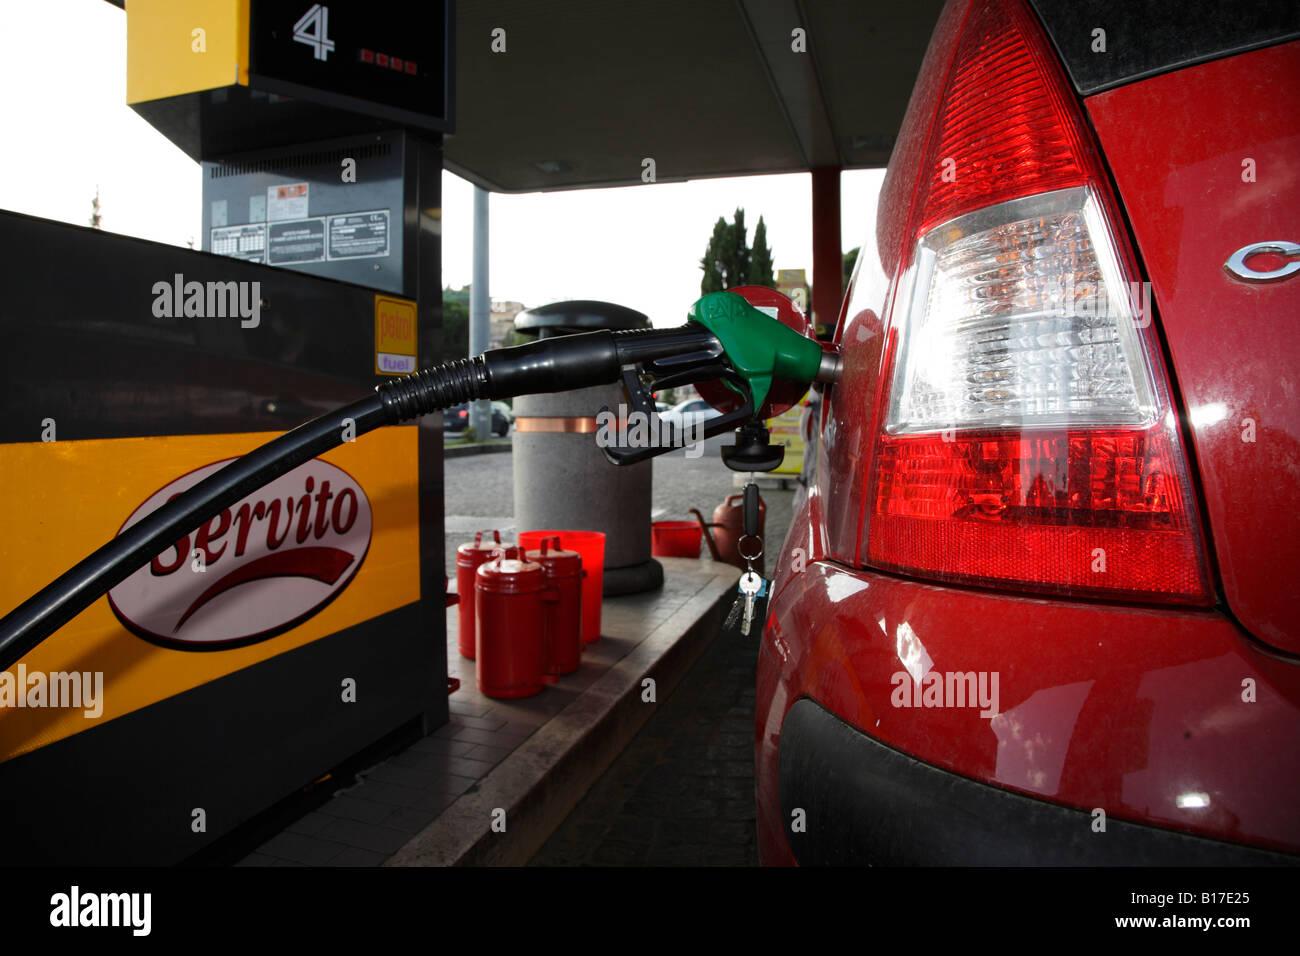 Self Service Petrol Pump Stock Photos Suzuki Swift Fuel Filling Car On Station Forecourt Image